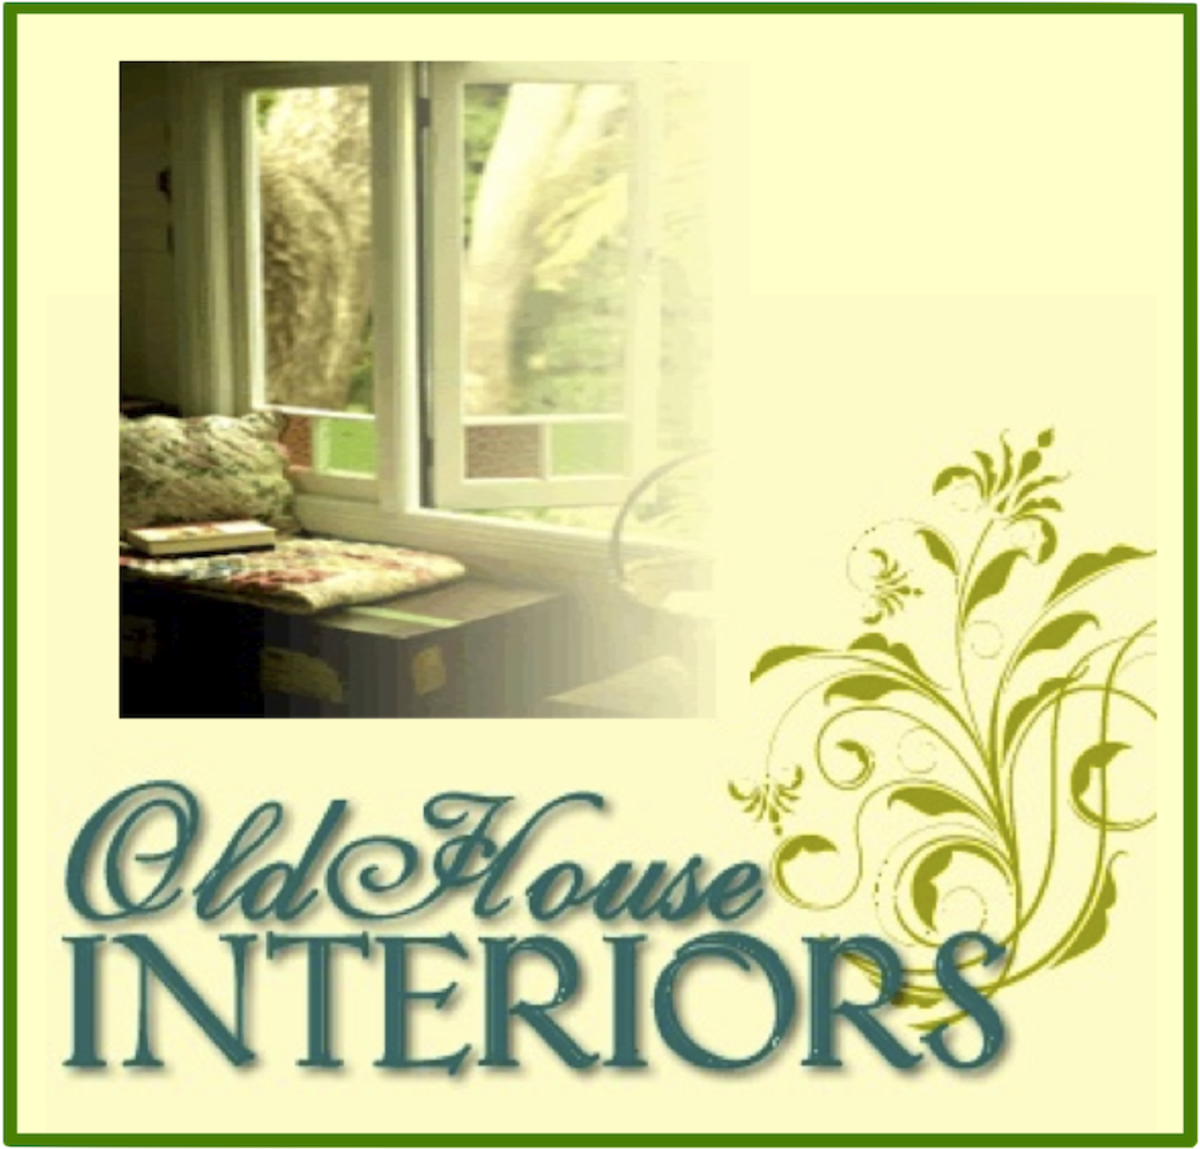 oldhouseinteriors_wallpaperhistory